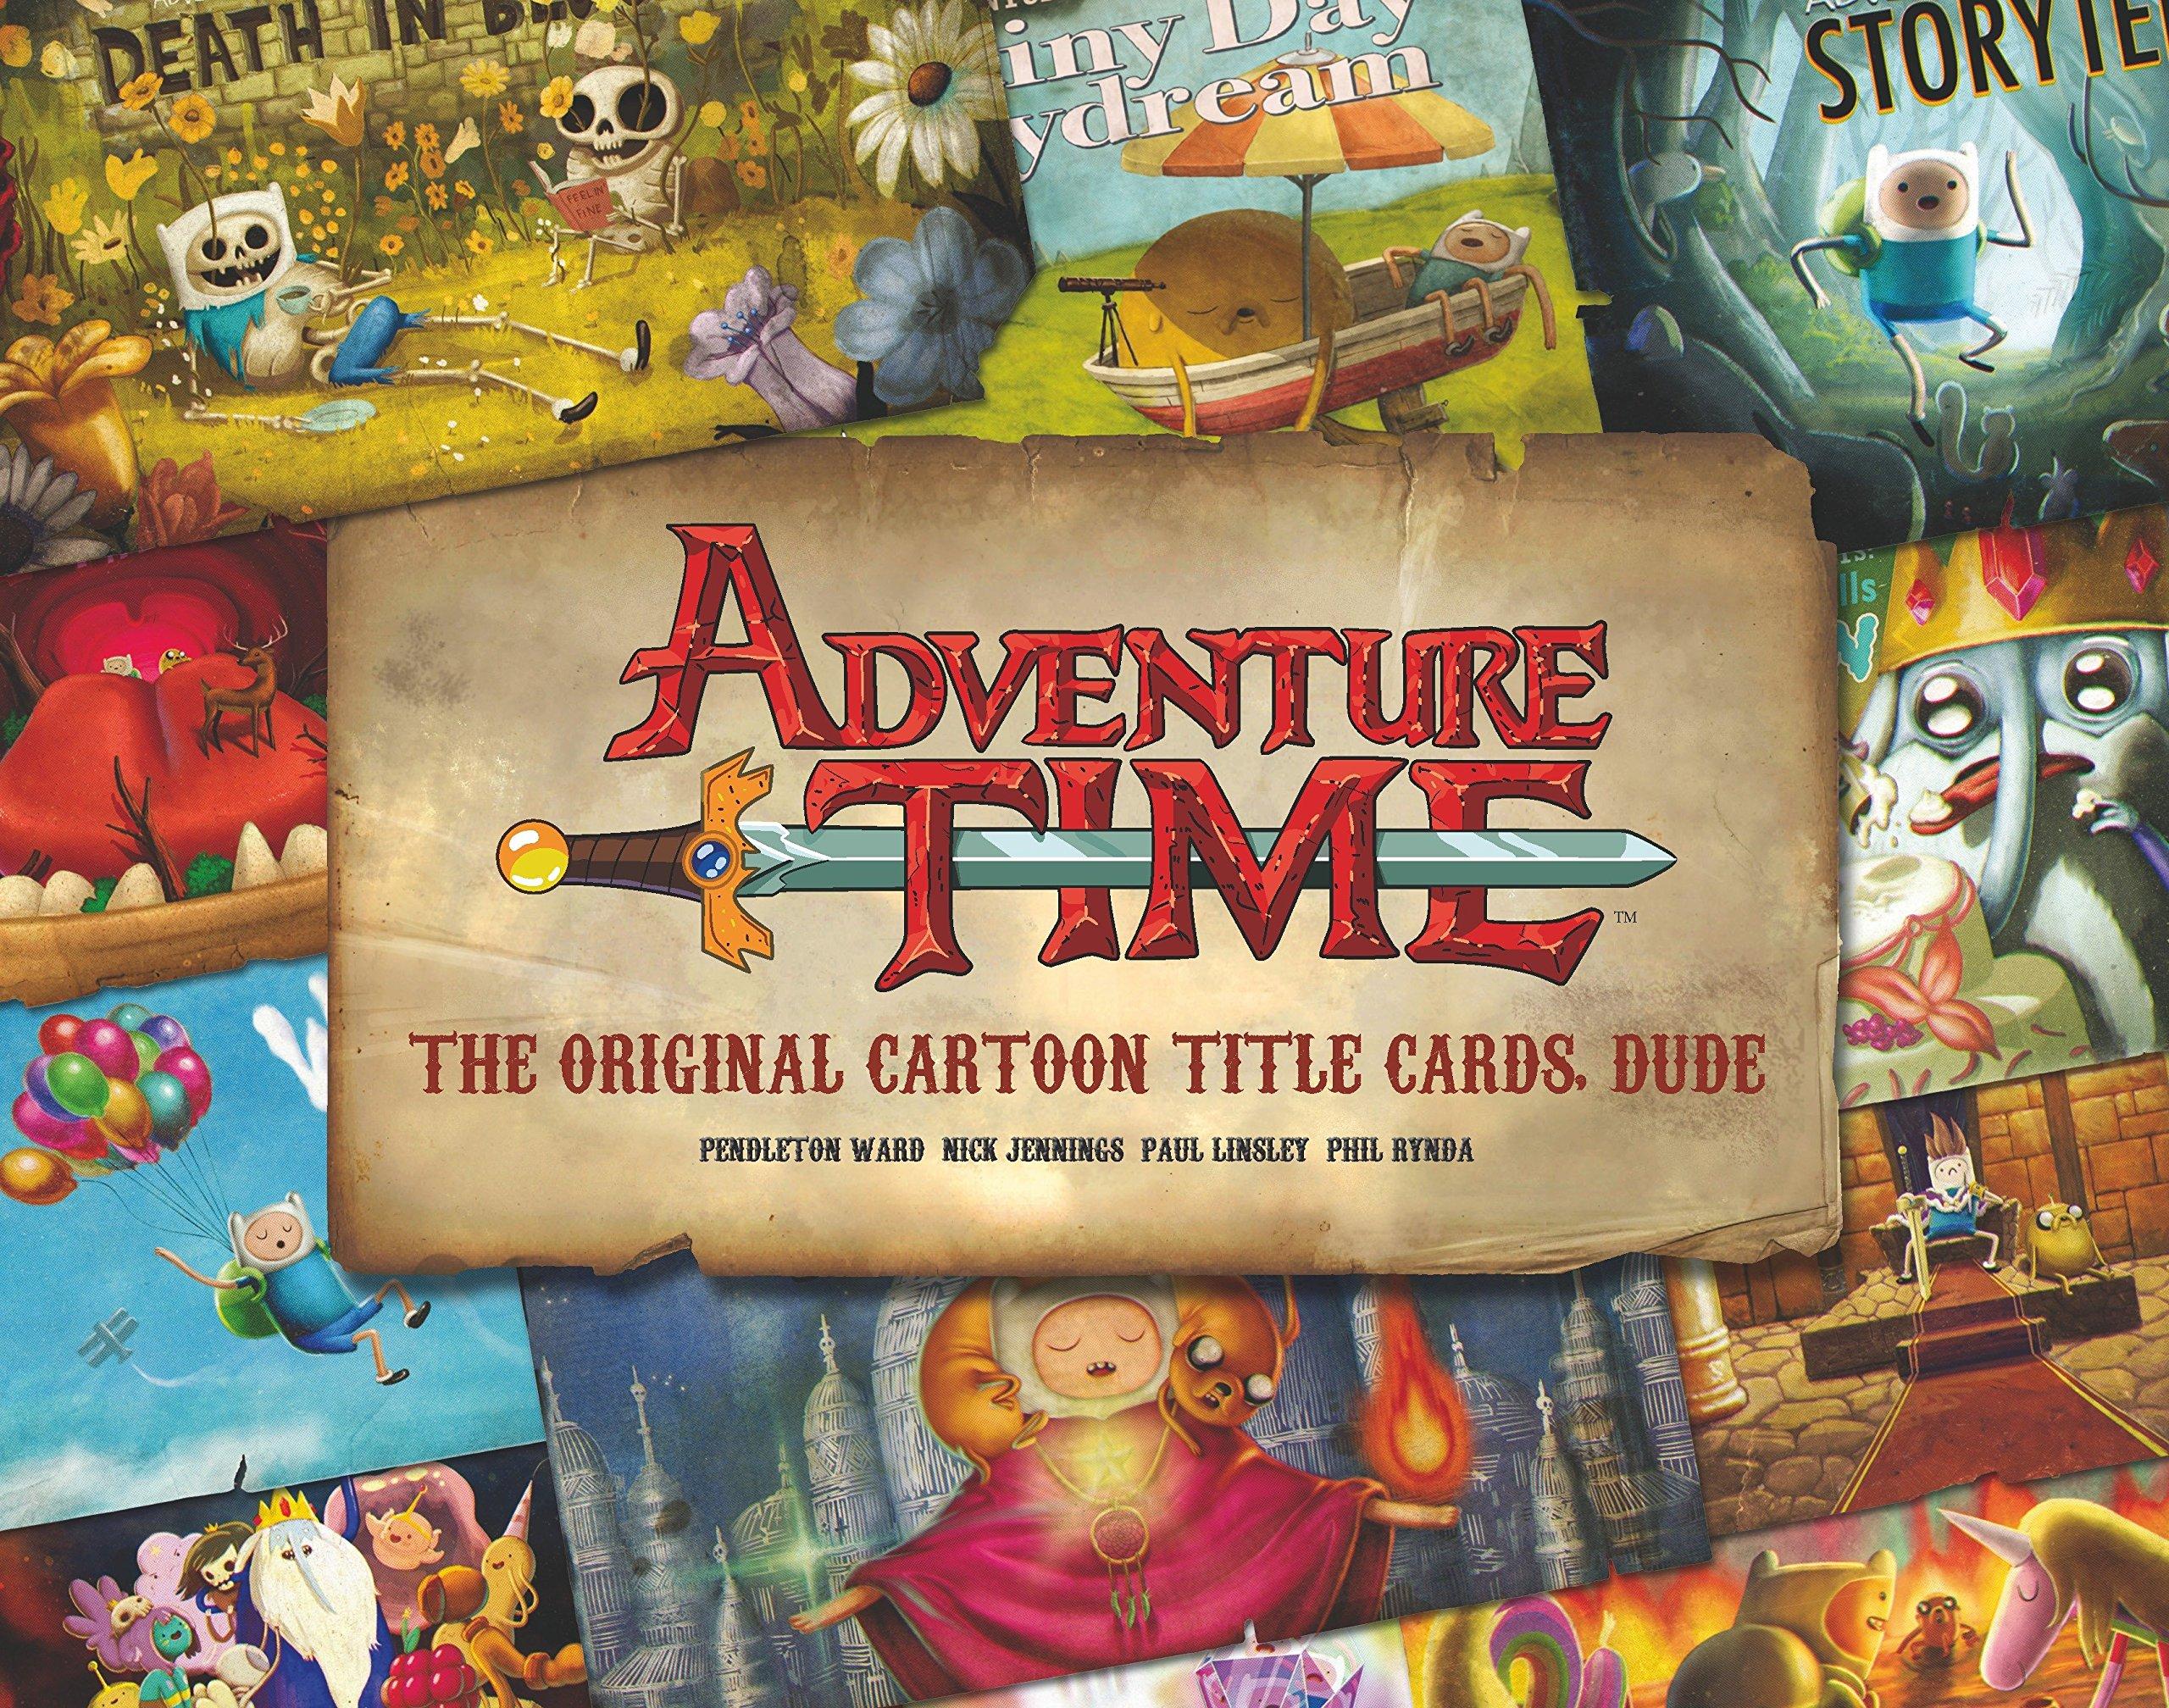 Adventure Time: The Original Cartoon Title Cards (Vol 1): The Original Cartoon Title Cards Seasons 1 & 2 by Titan Books